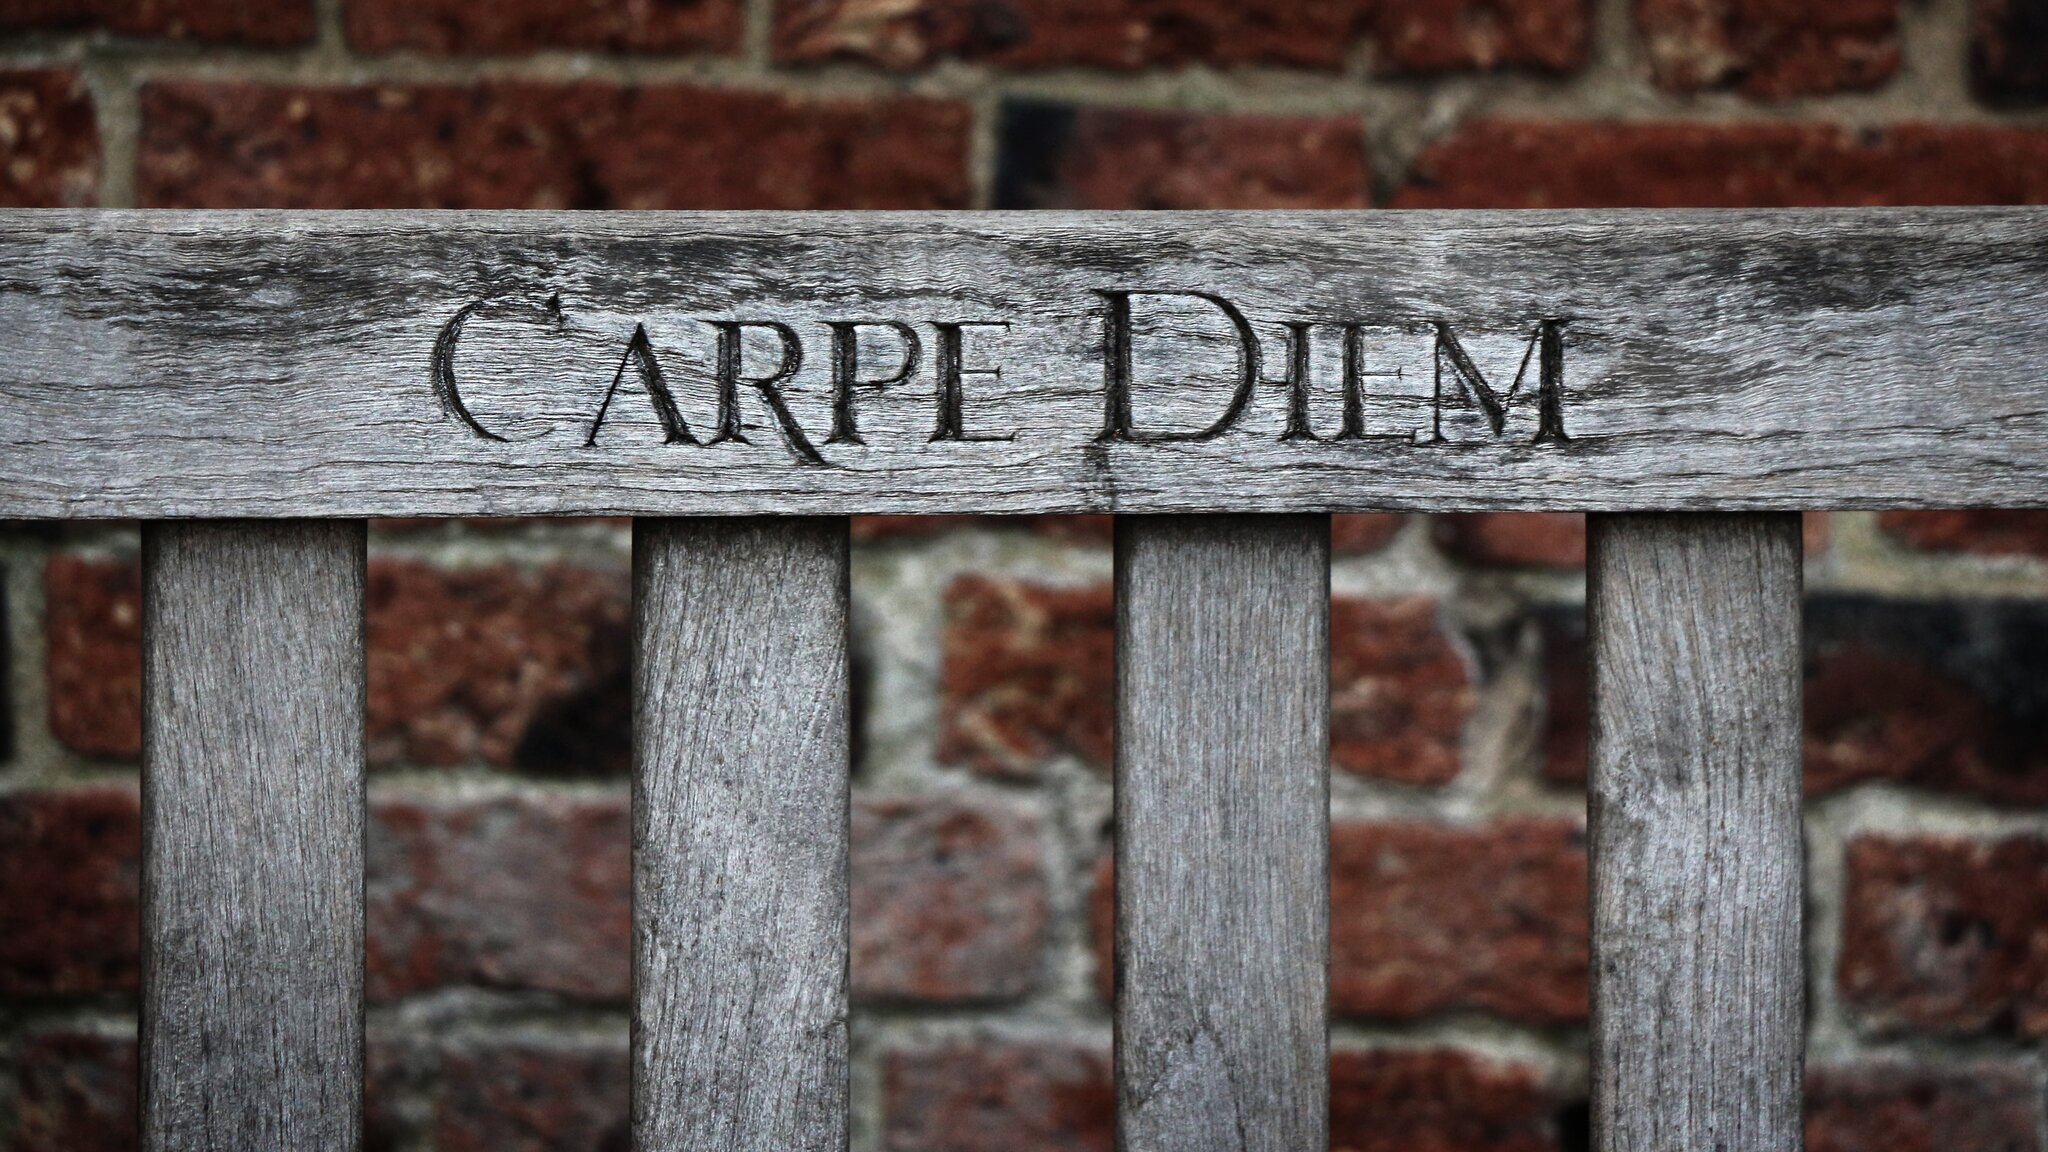 Carpe diem_napis Źródło: Phill Connell, fotografia barwna, licencja: CC BY-NC-ND 2.0.